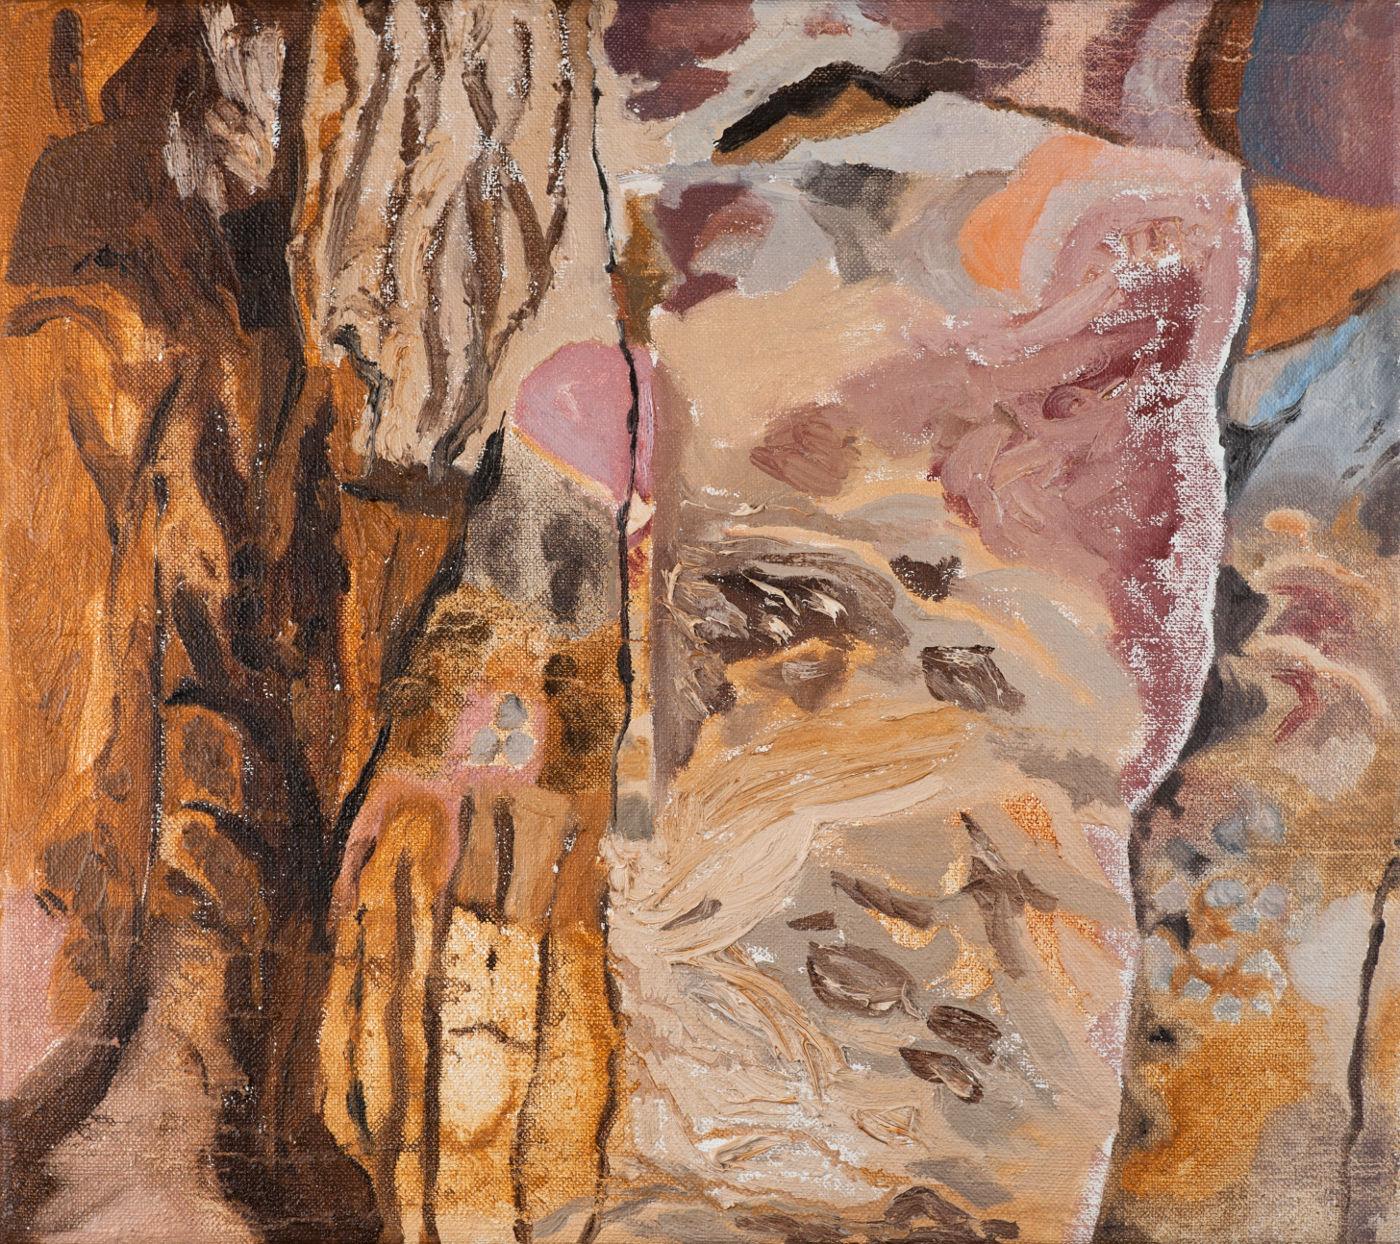 Jan Karpíšek: The Portrait of Mr. Píro's Rock, oil on canvas, 40x45 cm, 2012